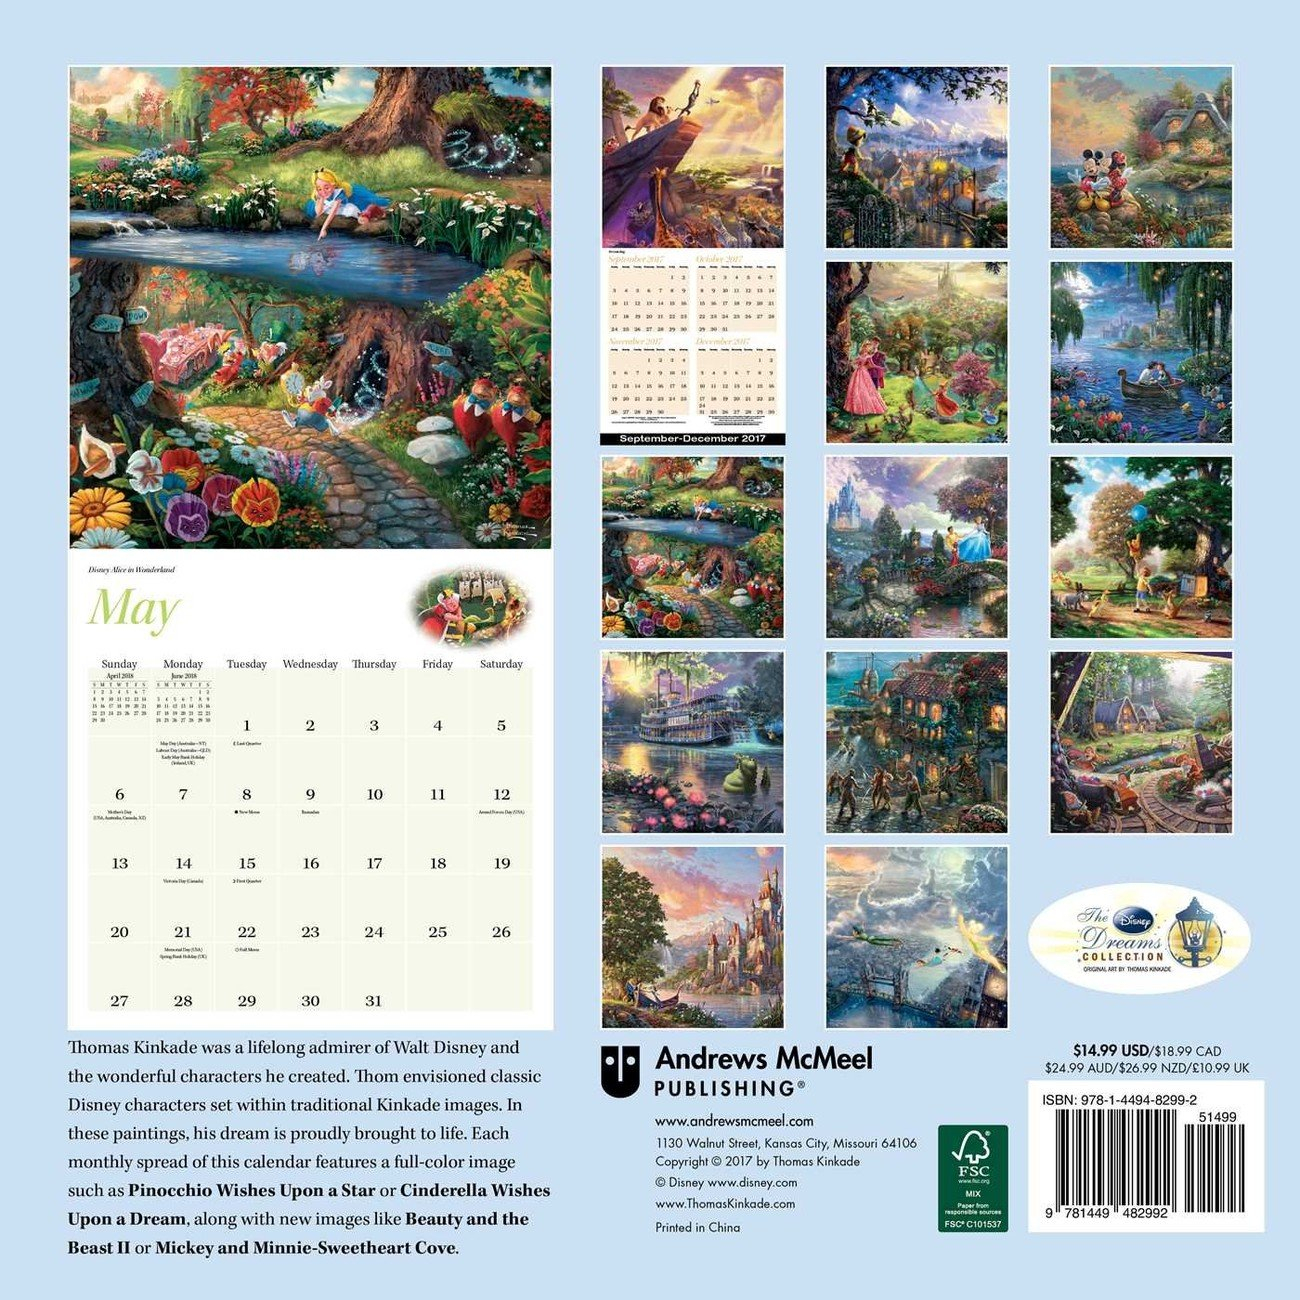 Thomas Kinkade – The Disney Dreams Collection Календарі 2020 На Calendar 2019 Thomas Kinkade